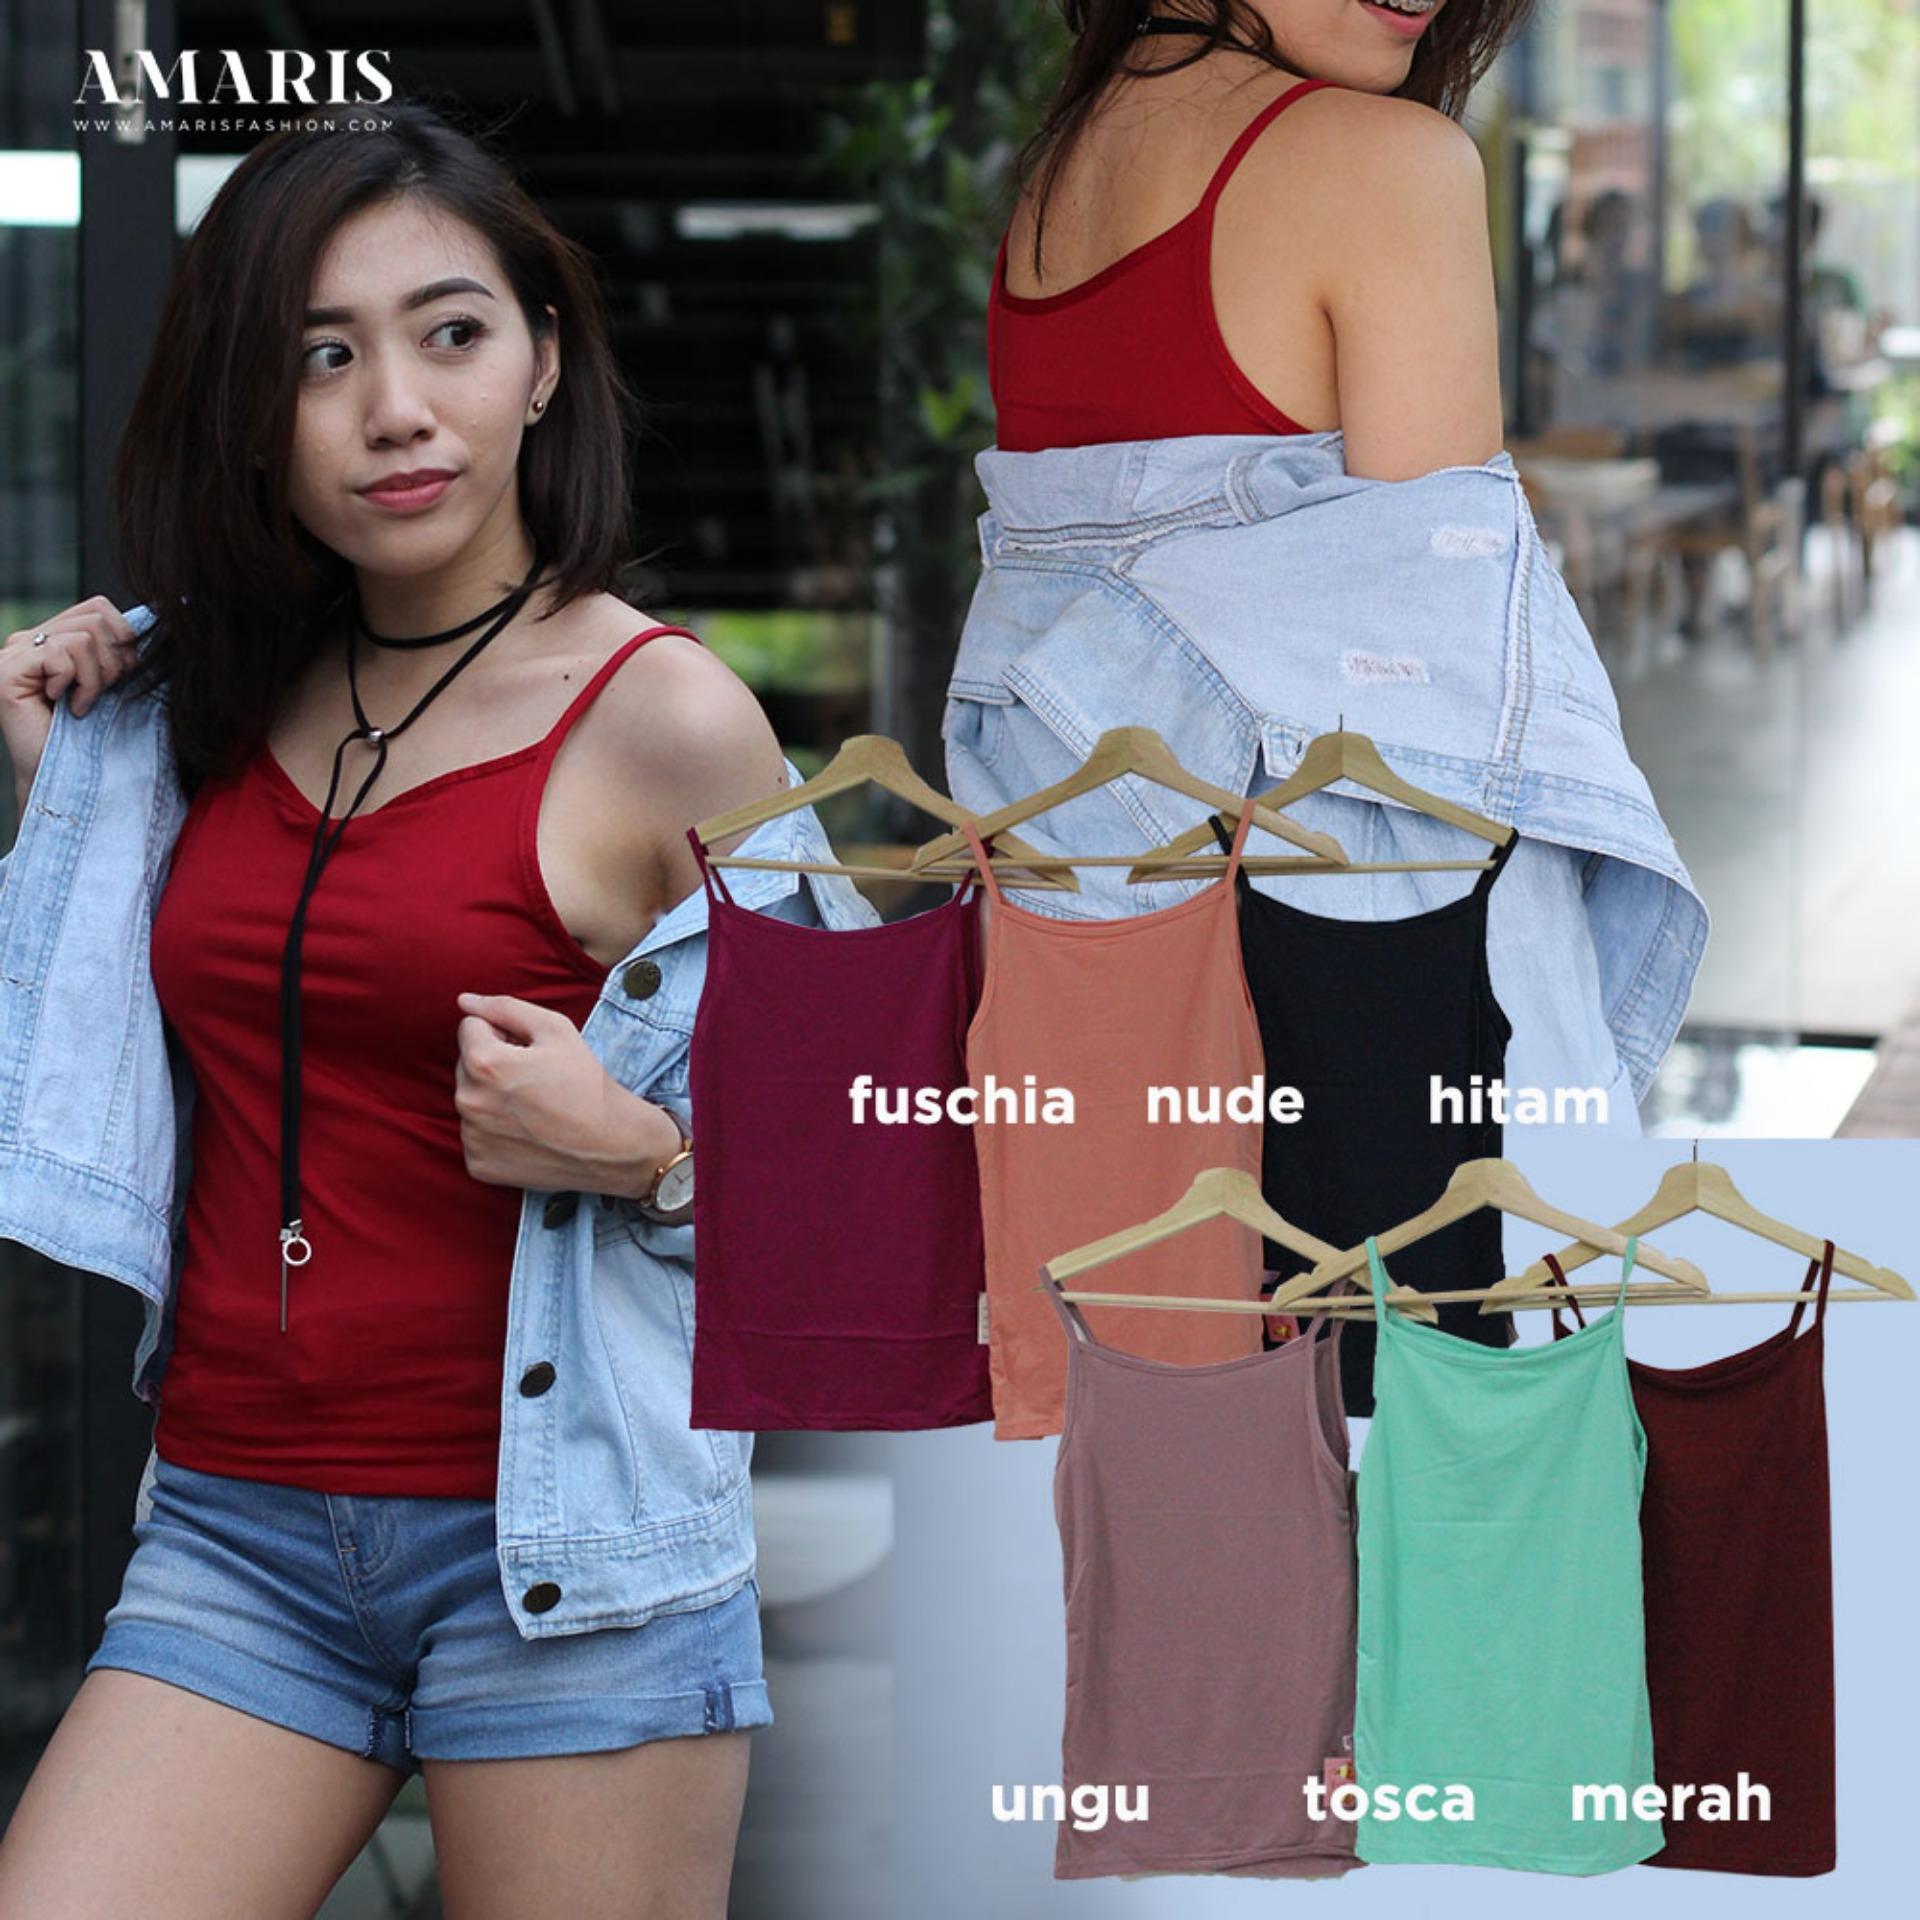 Cek Harga Baru Amaris Fashion Tanktop Singlet Tali Kecil Multicolor Baju Kaos Pria Murah